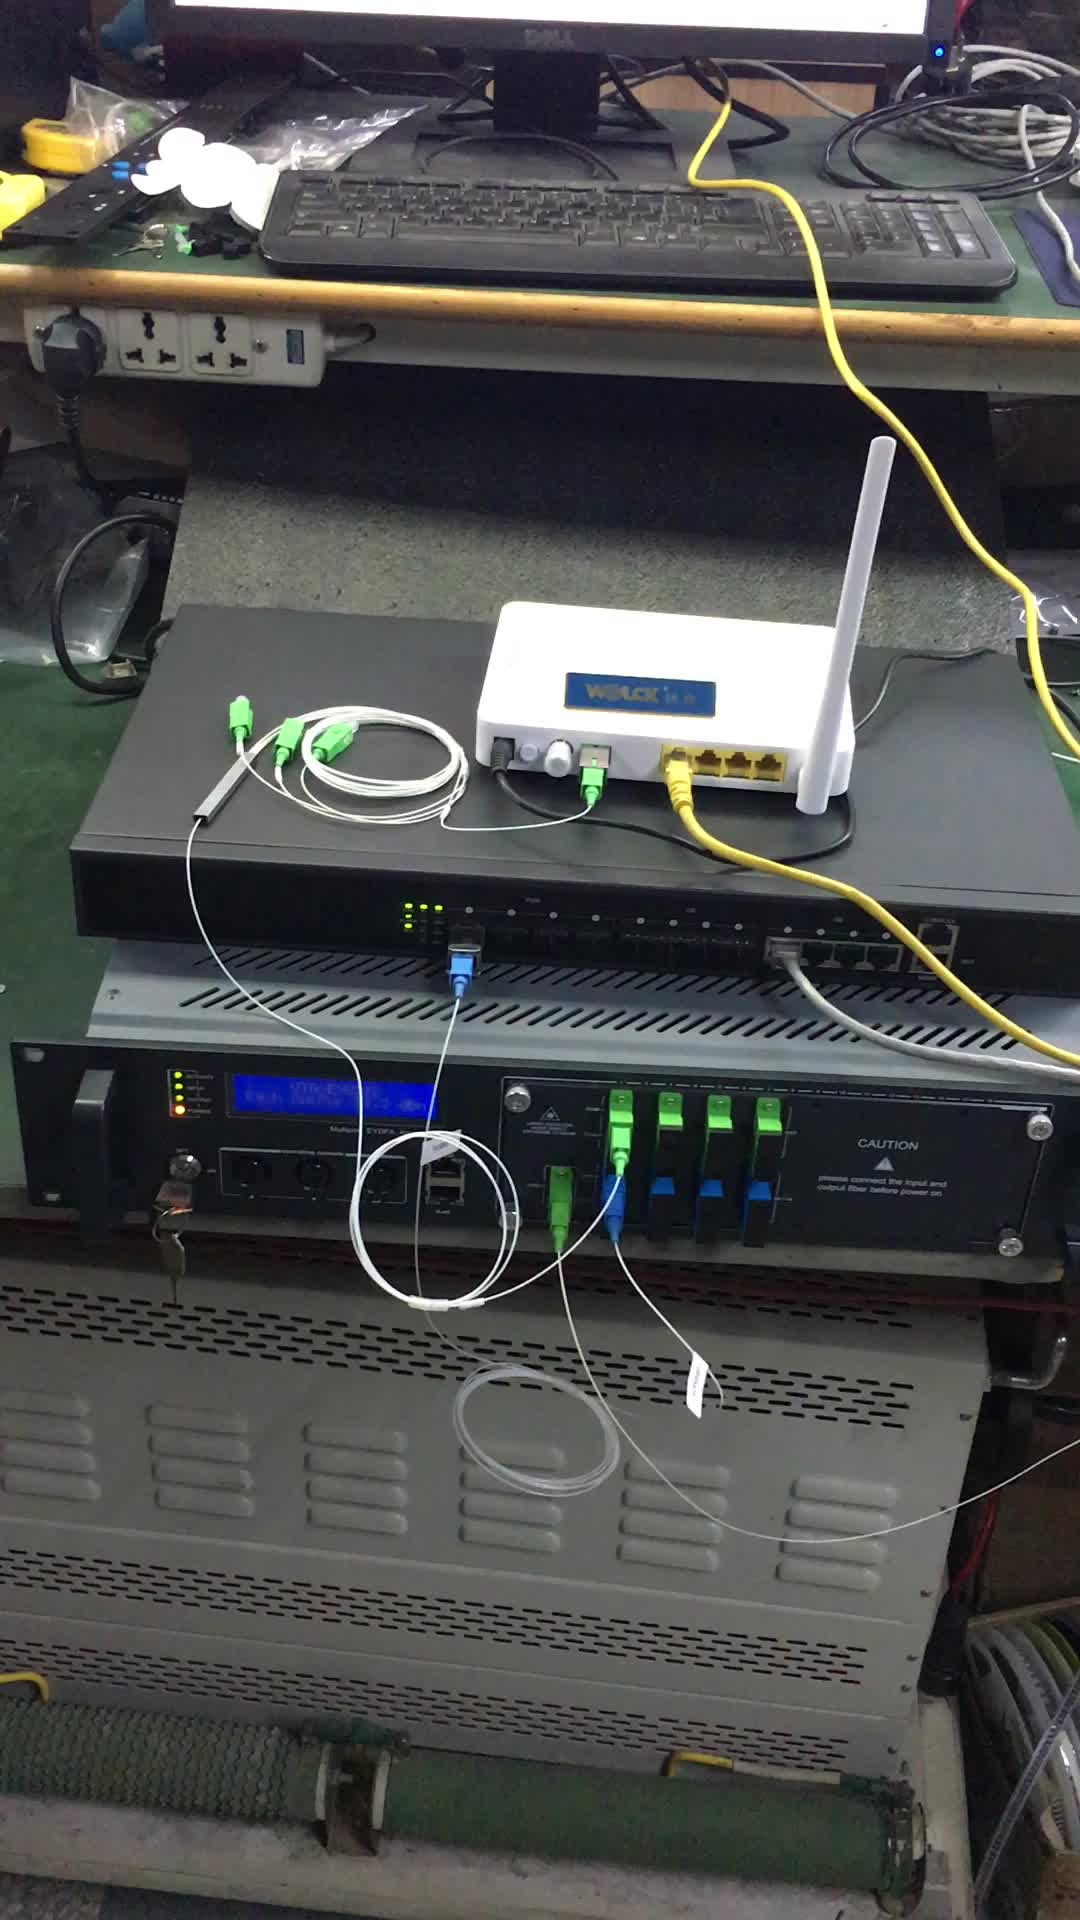 FTTH Optical Line Terminal 4 PON OLT Fiber Optic Equipment